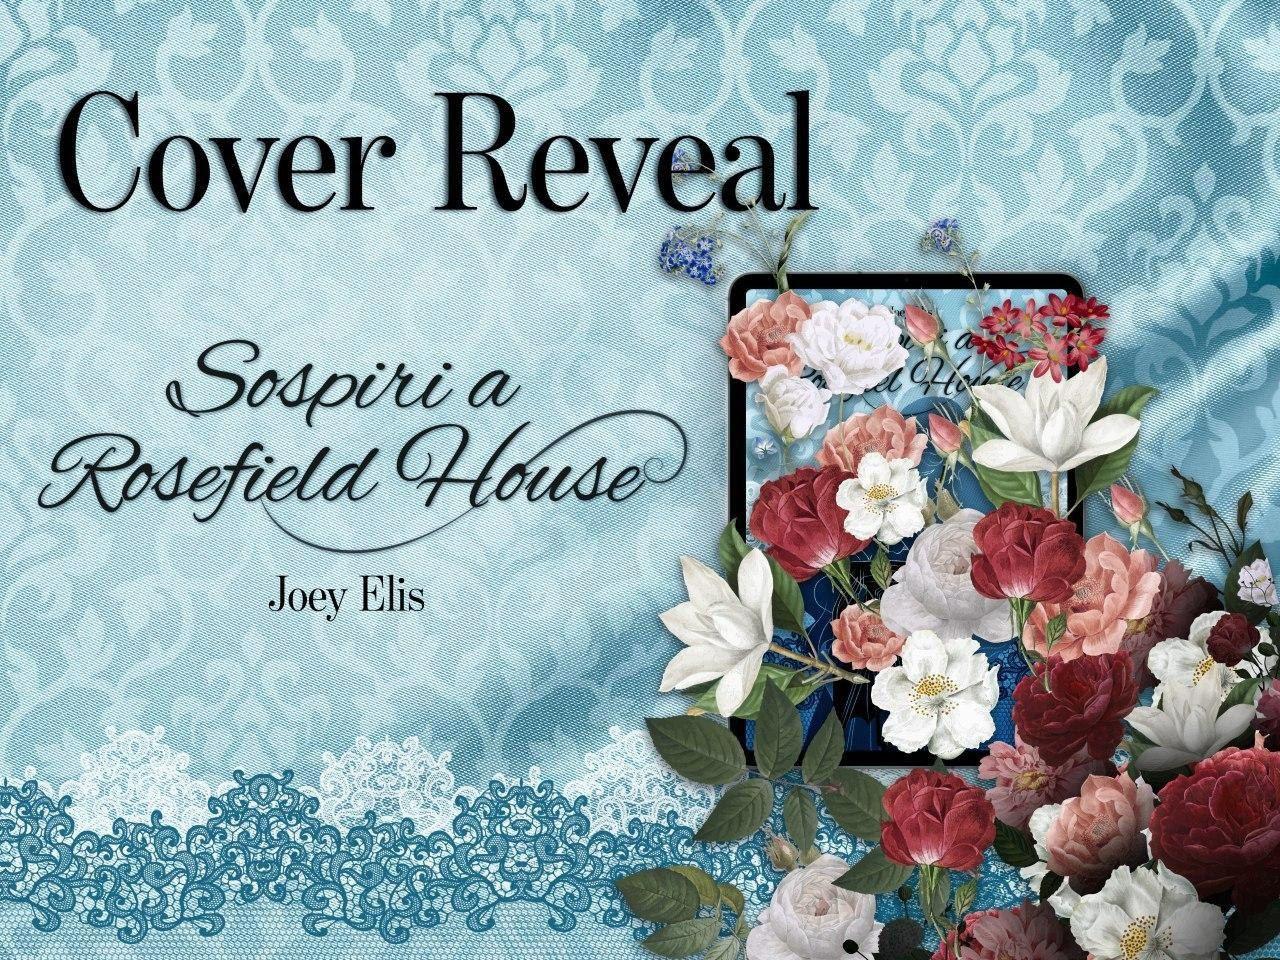 Cover Reveal : Sospiri a Rosefield House